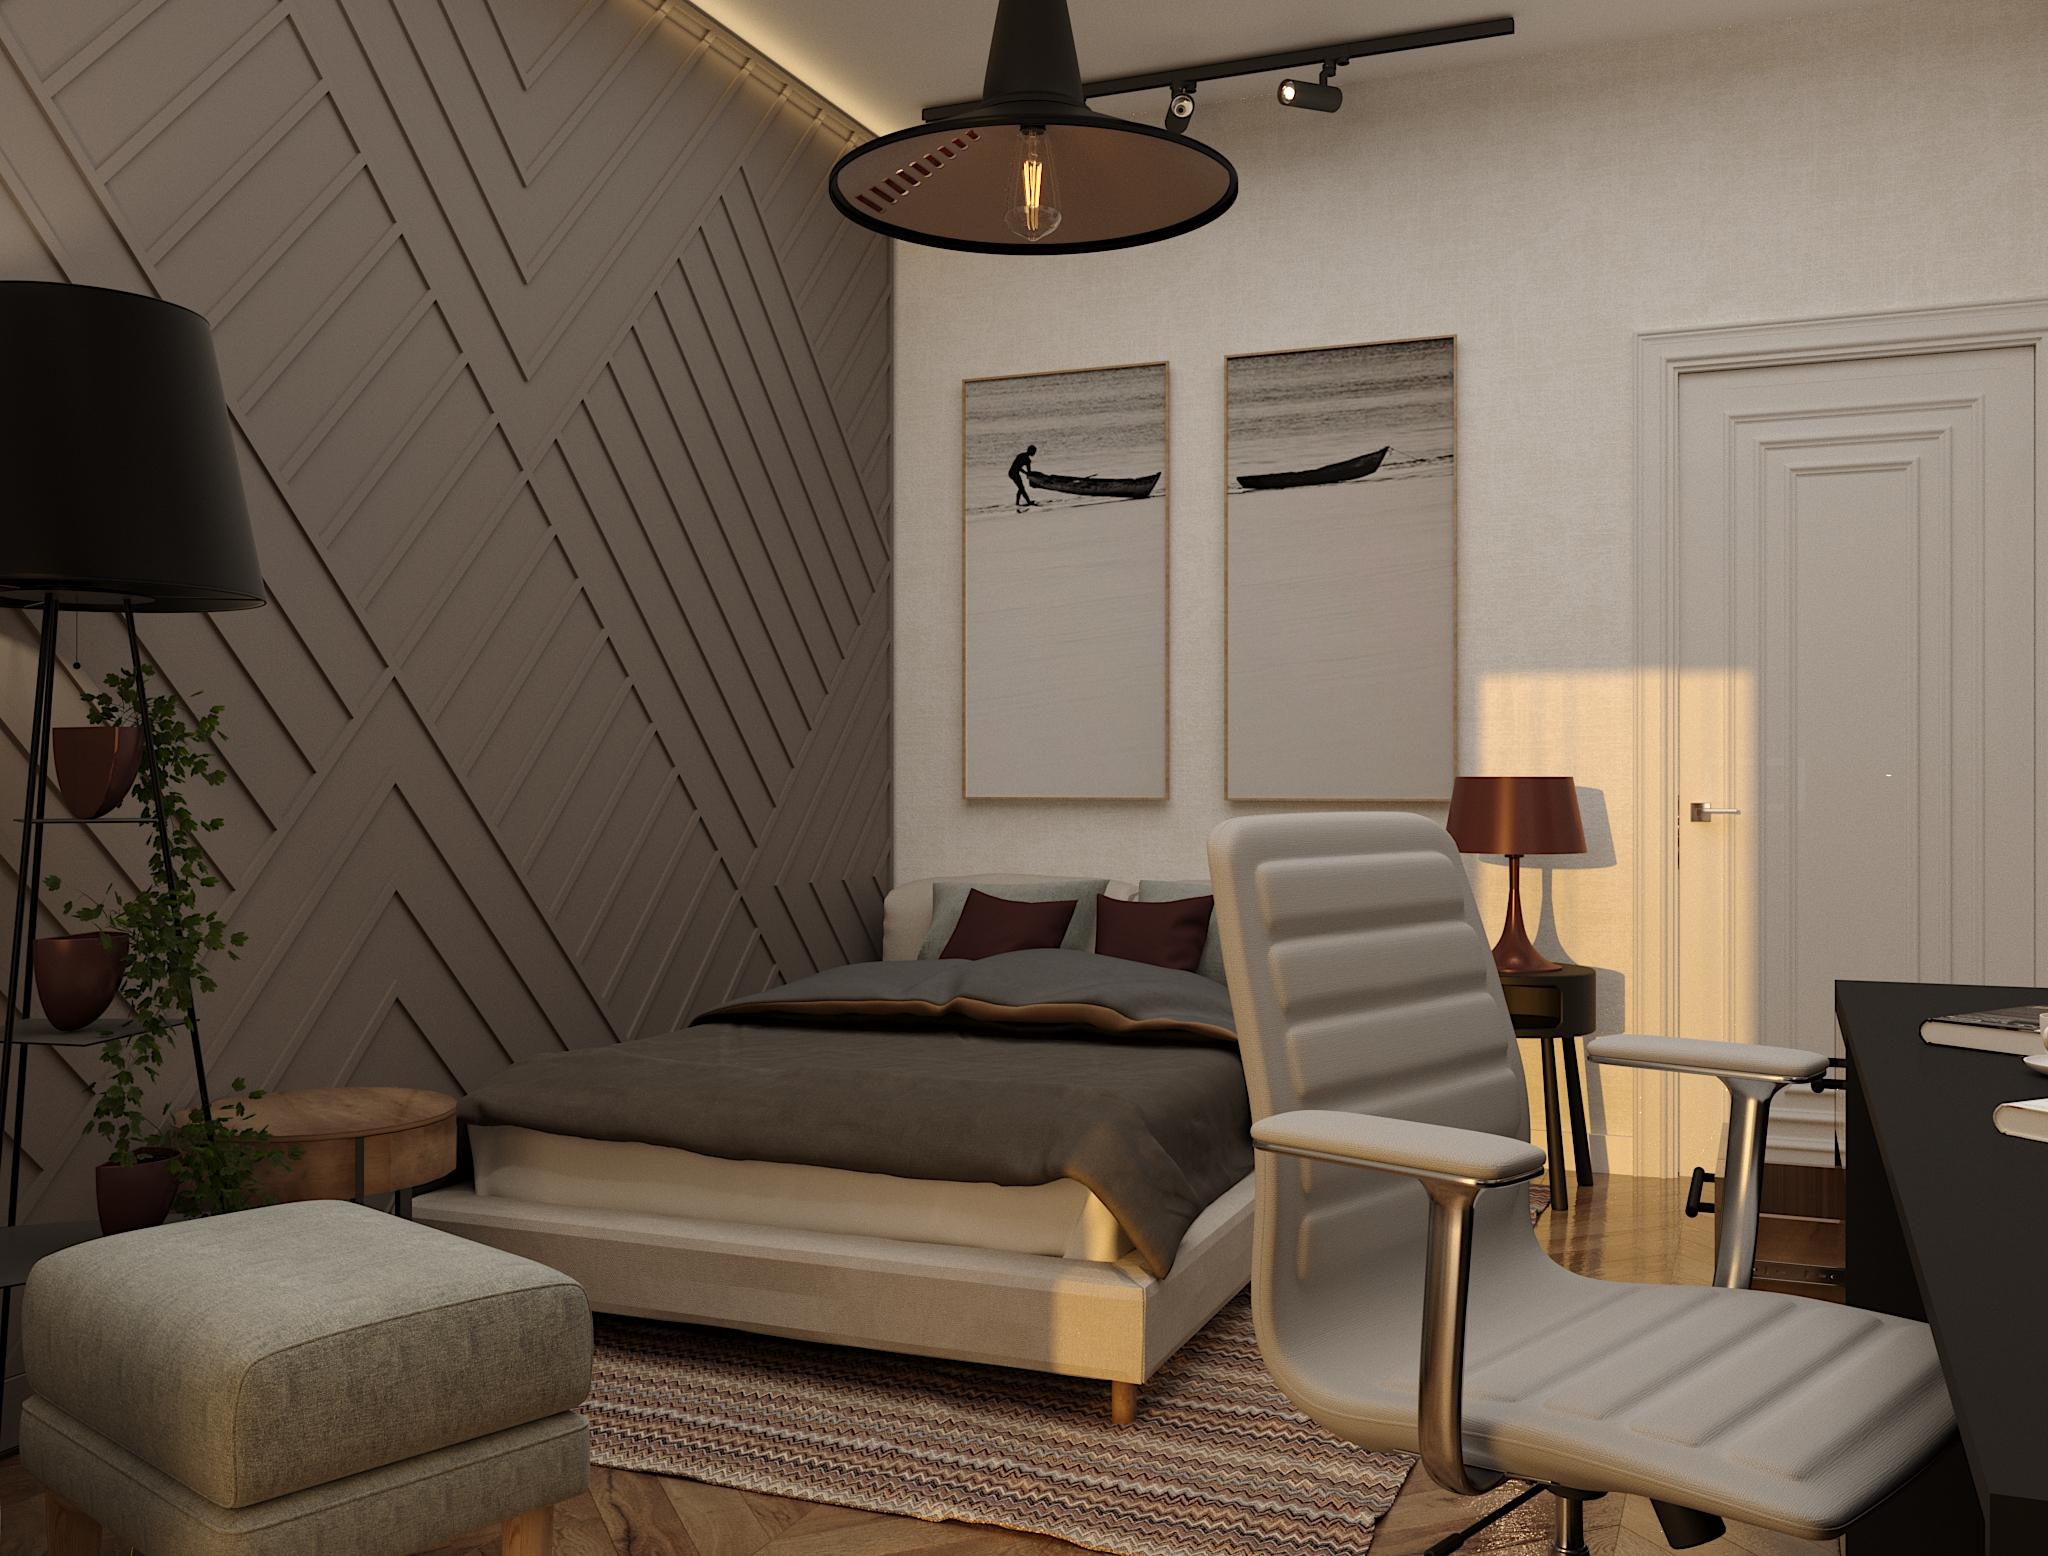 interieris dizaini lisi verandaze